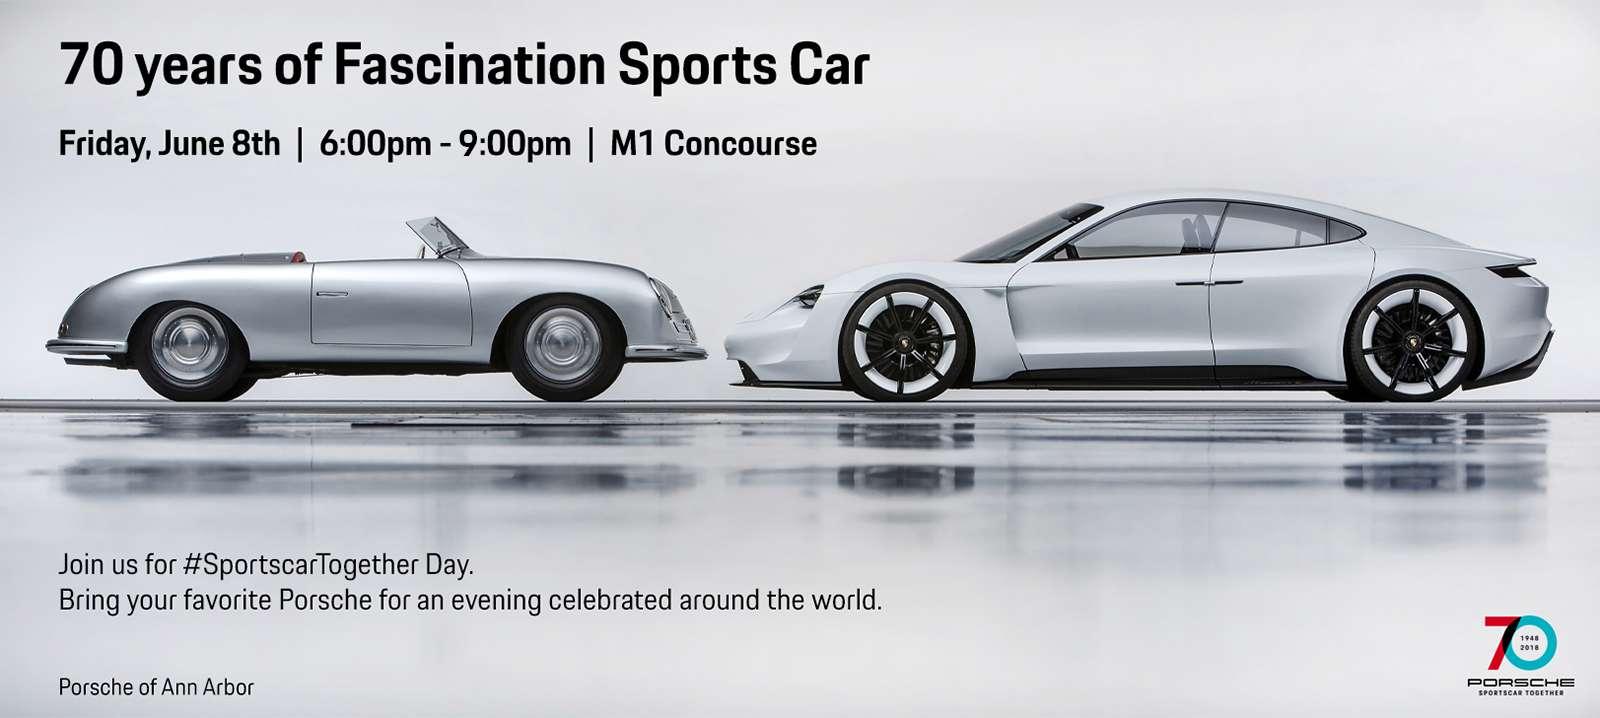 Porsche's 70th Anniversary Celebration